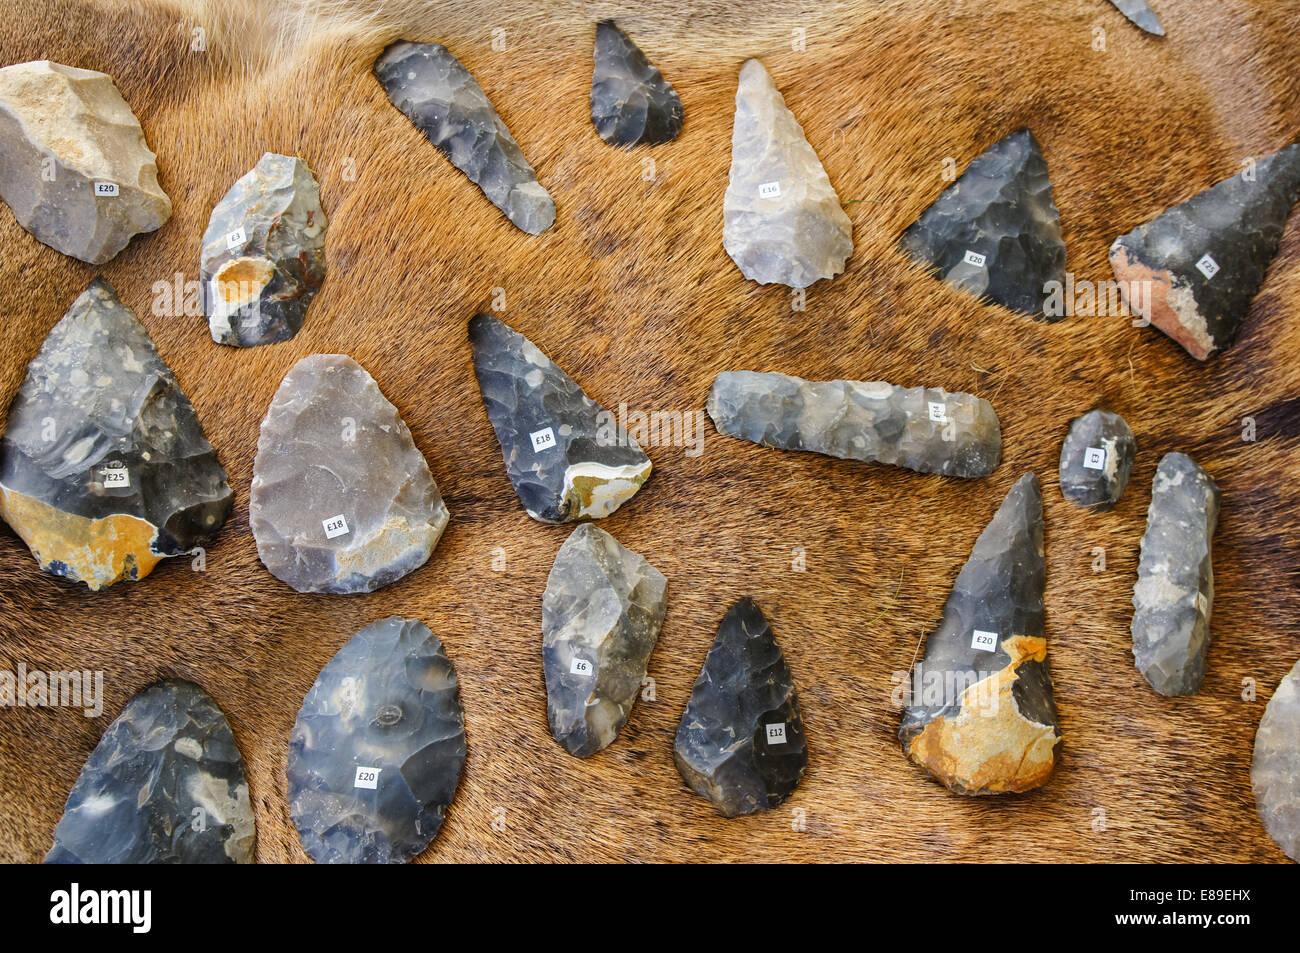 Archeology display at Countryside Live show, London England United Kingdom UK - Stock Image